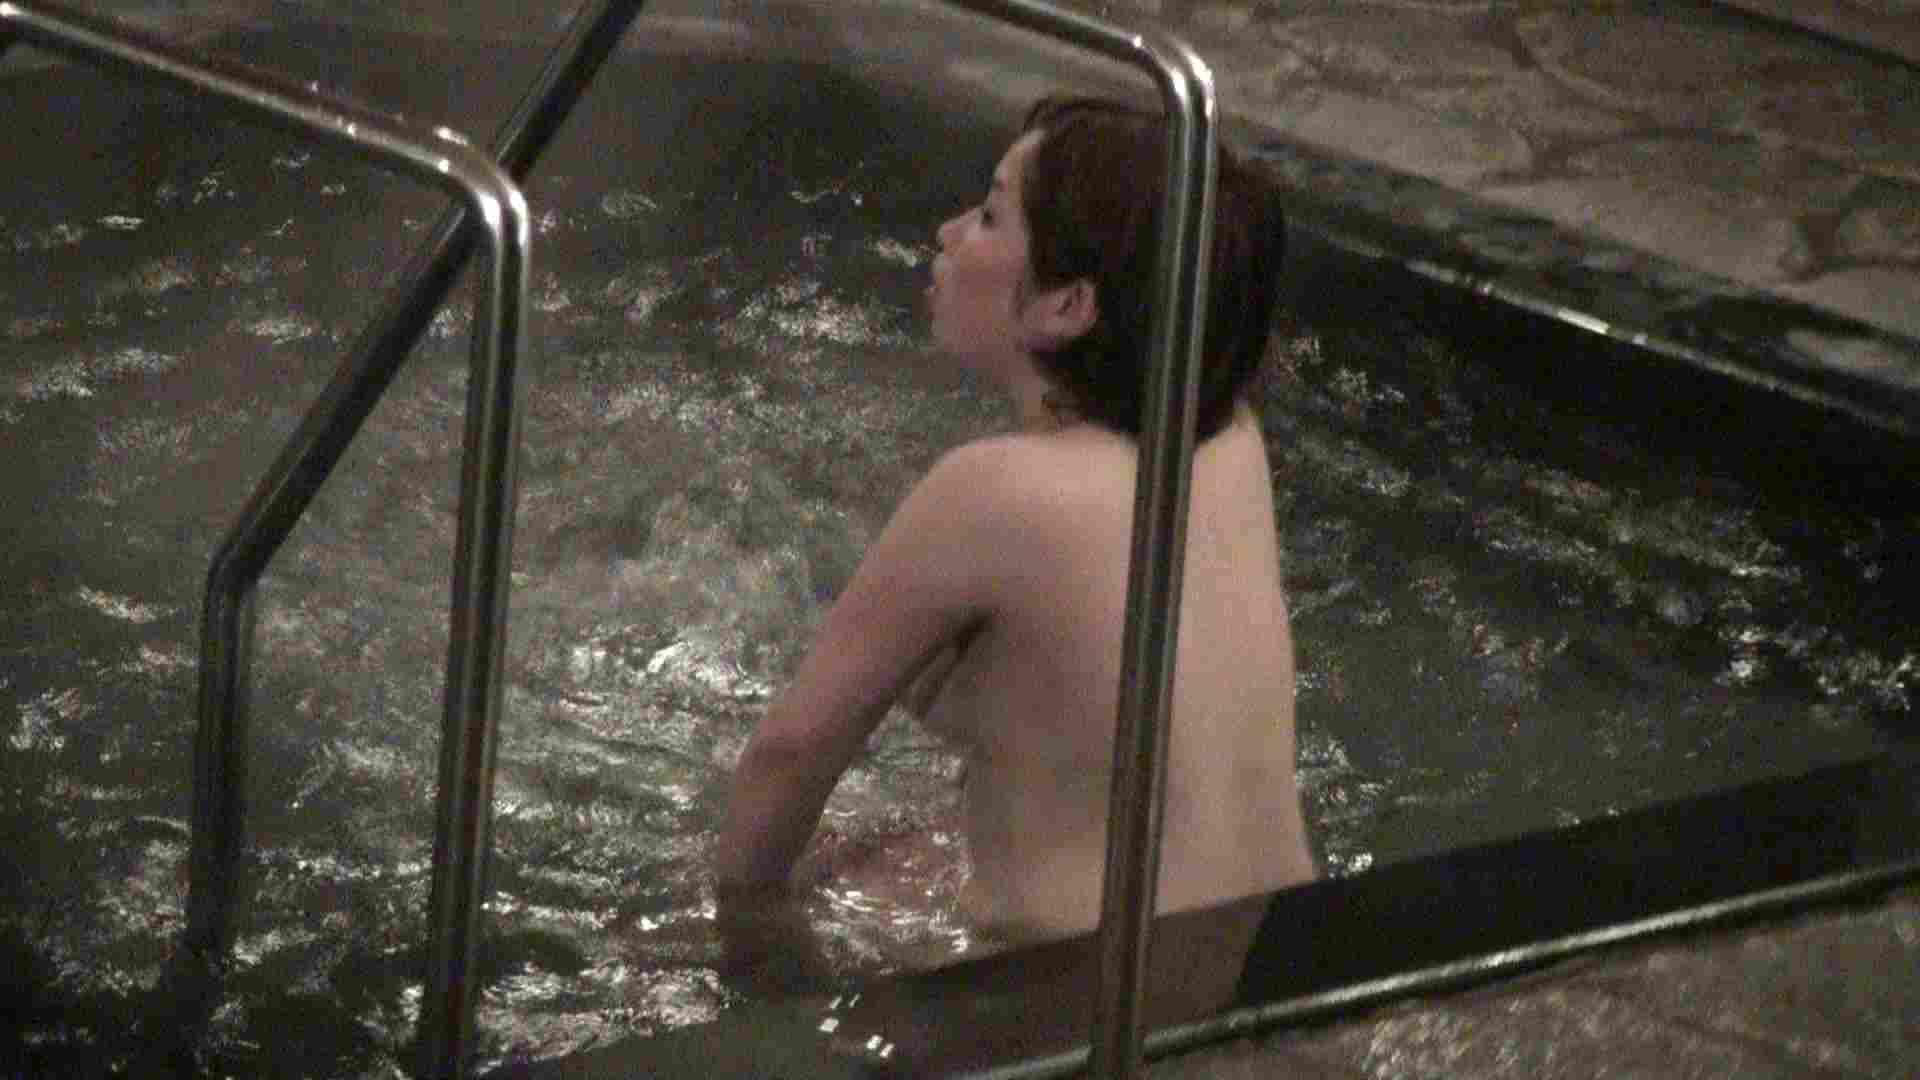 Aquaな露天風呂Vol.432 盗撮 エロ無料画像 73連発 62